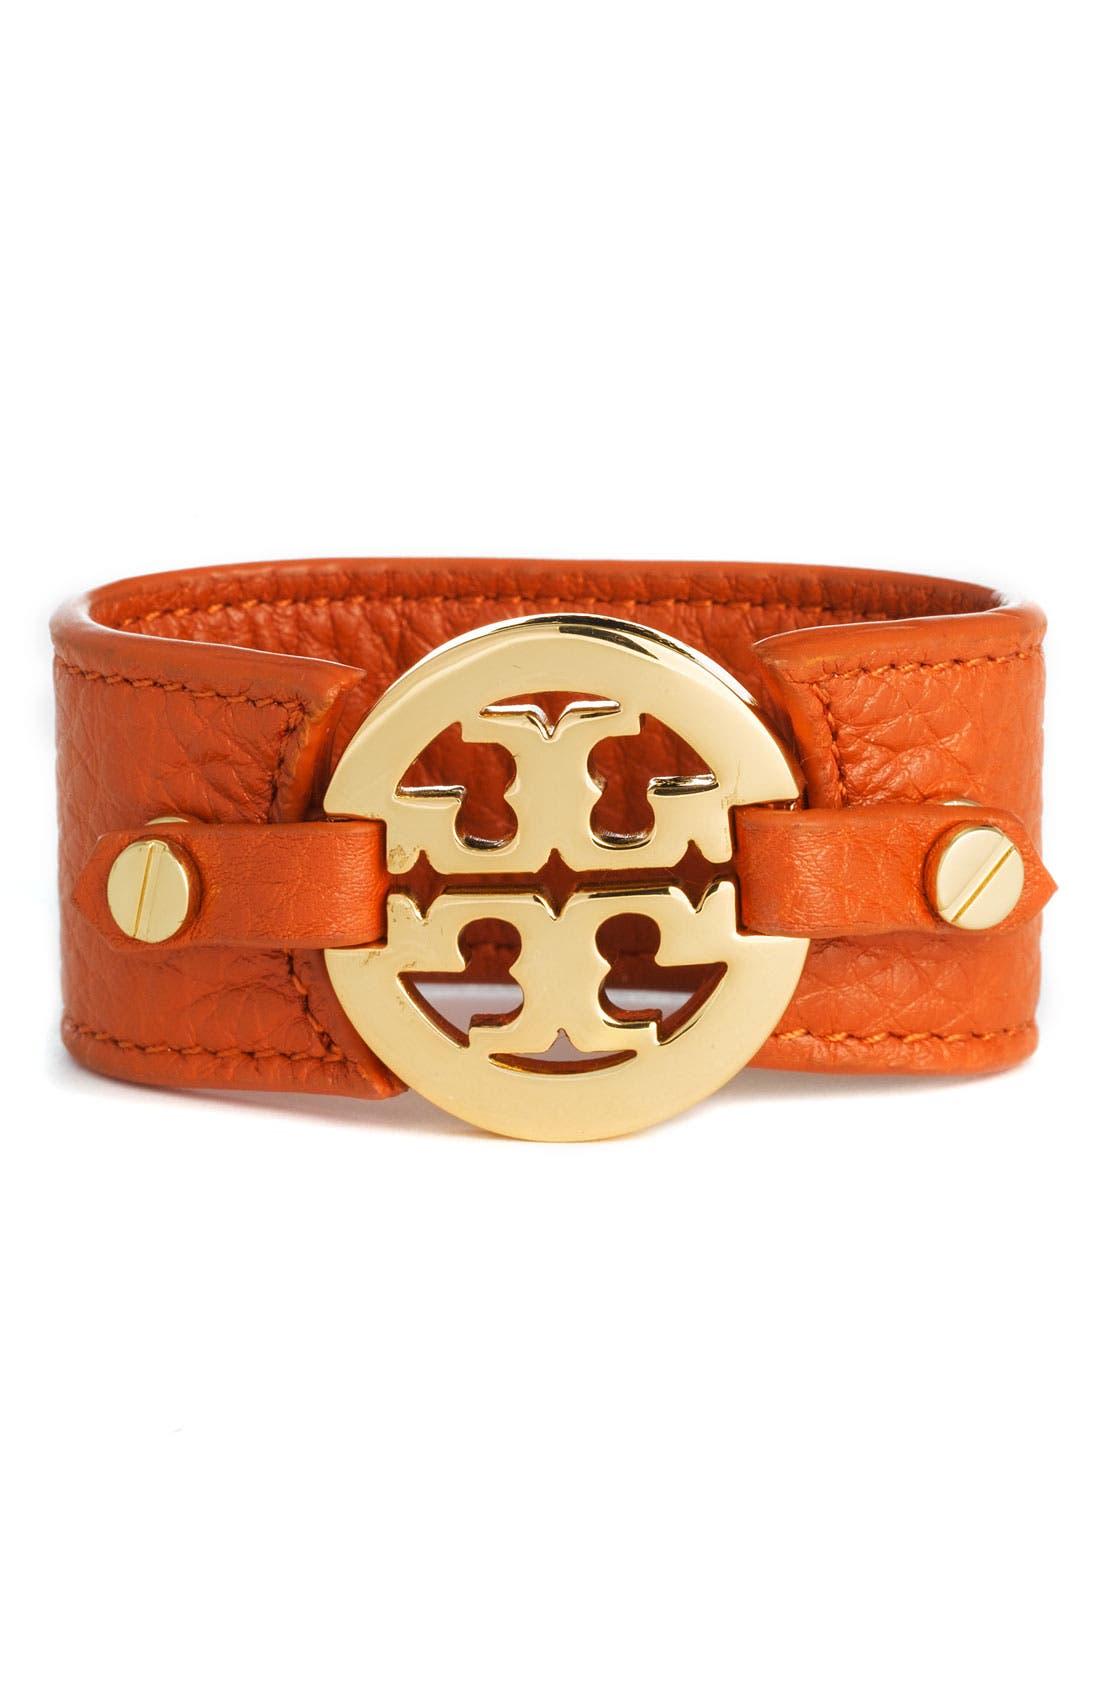 Alternate Image 1 Selected - Tory Burch Leather Logo Buckle Bracelet